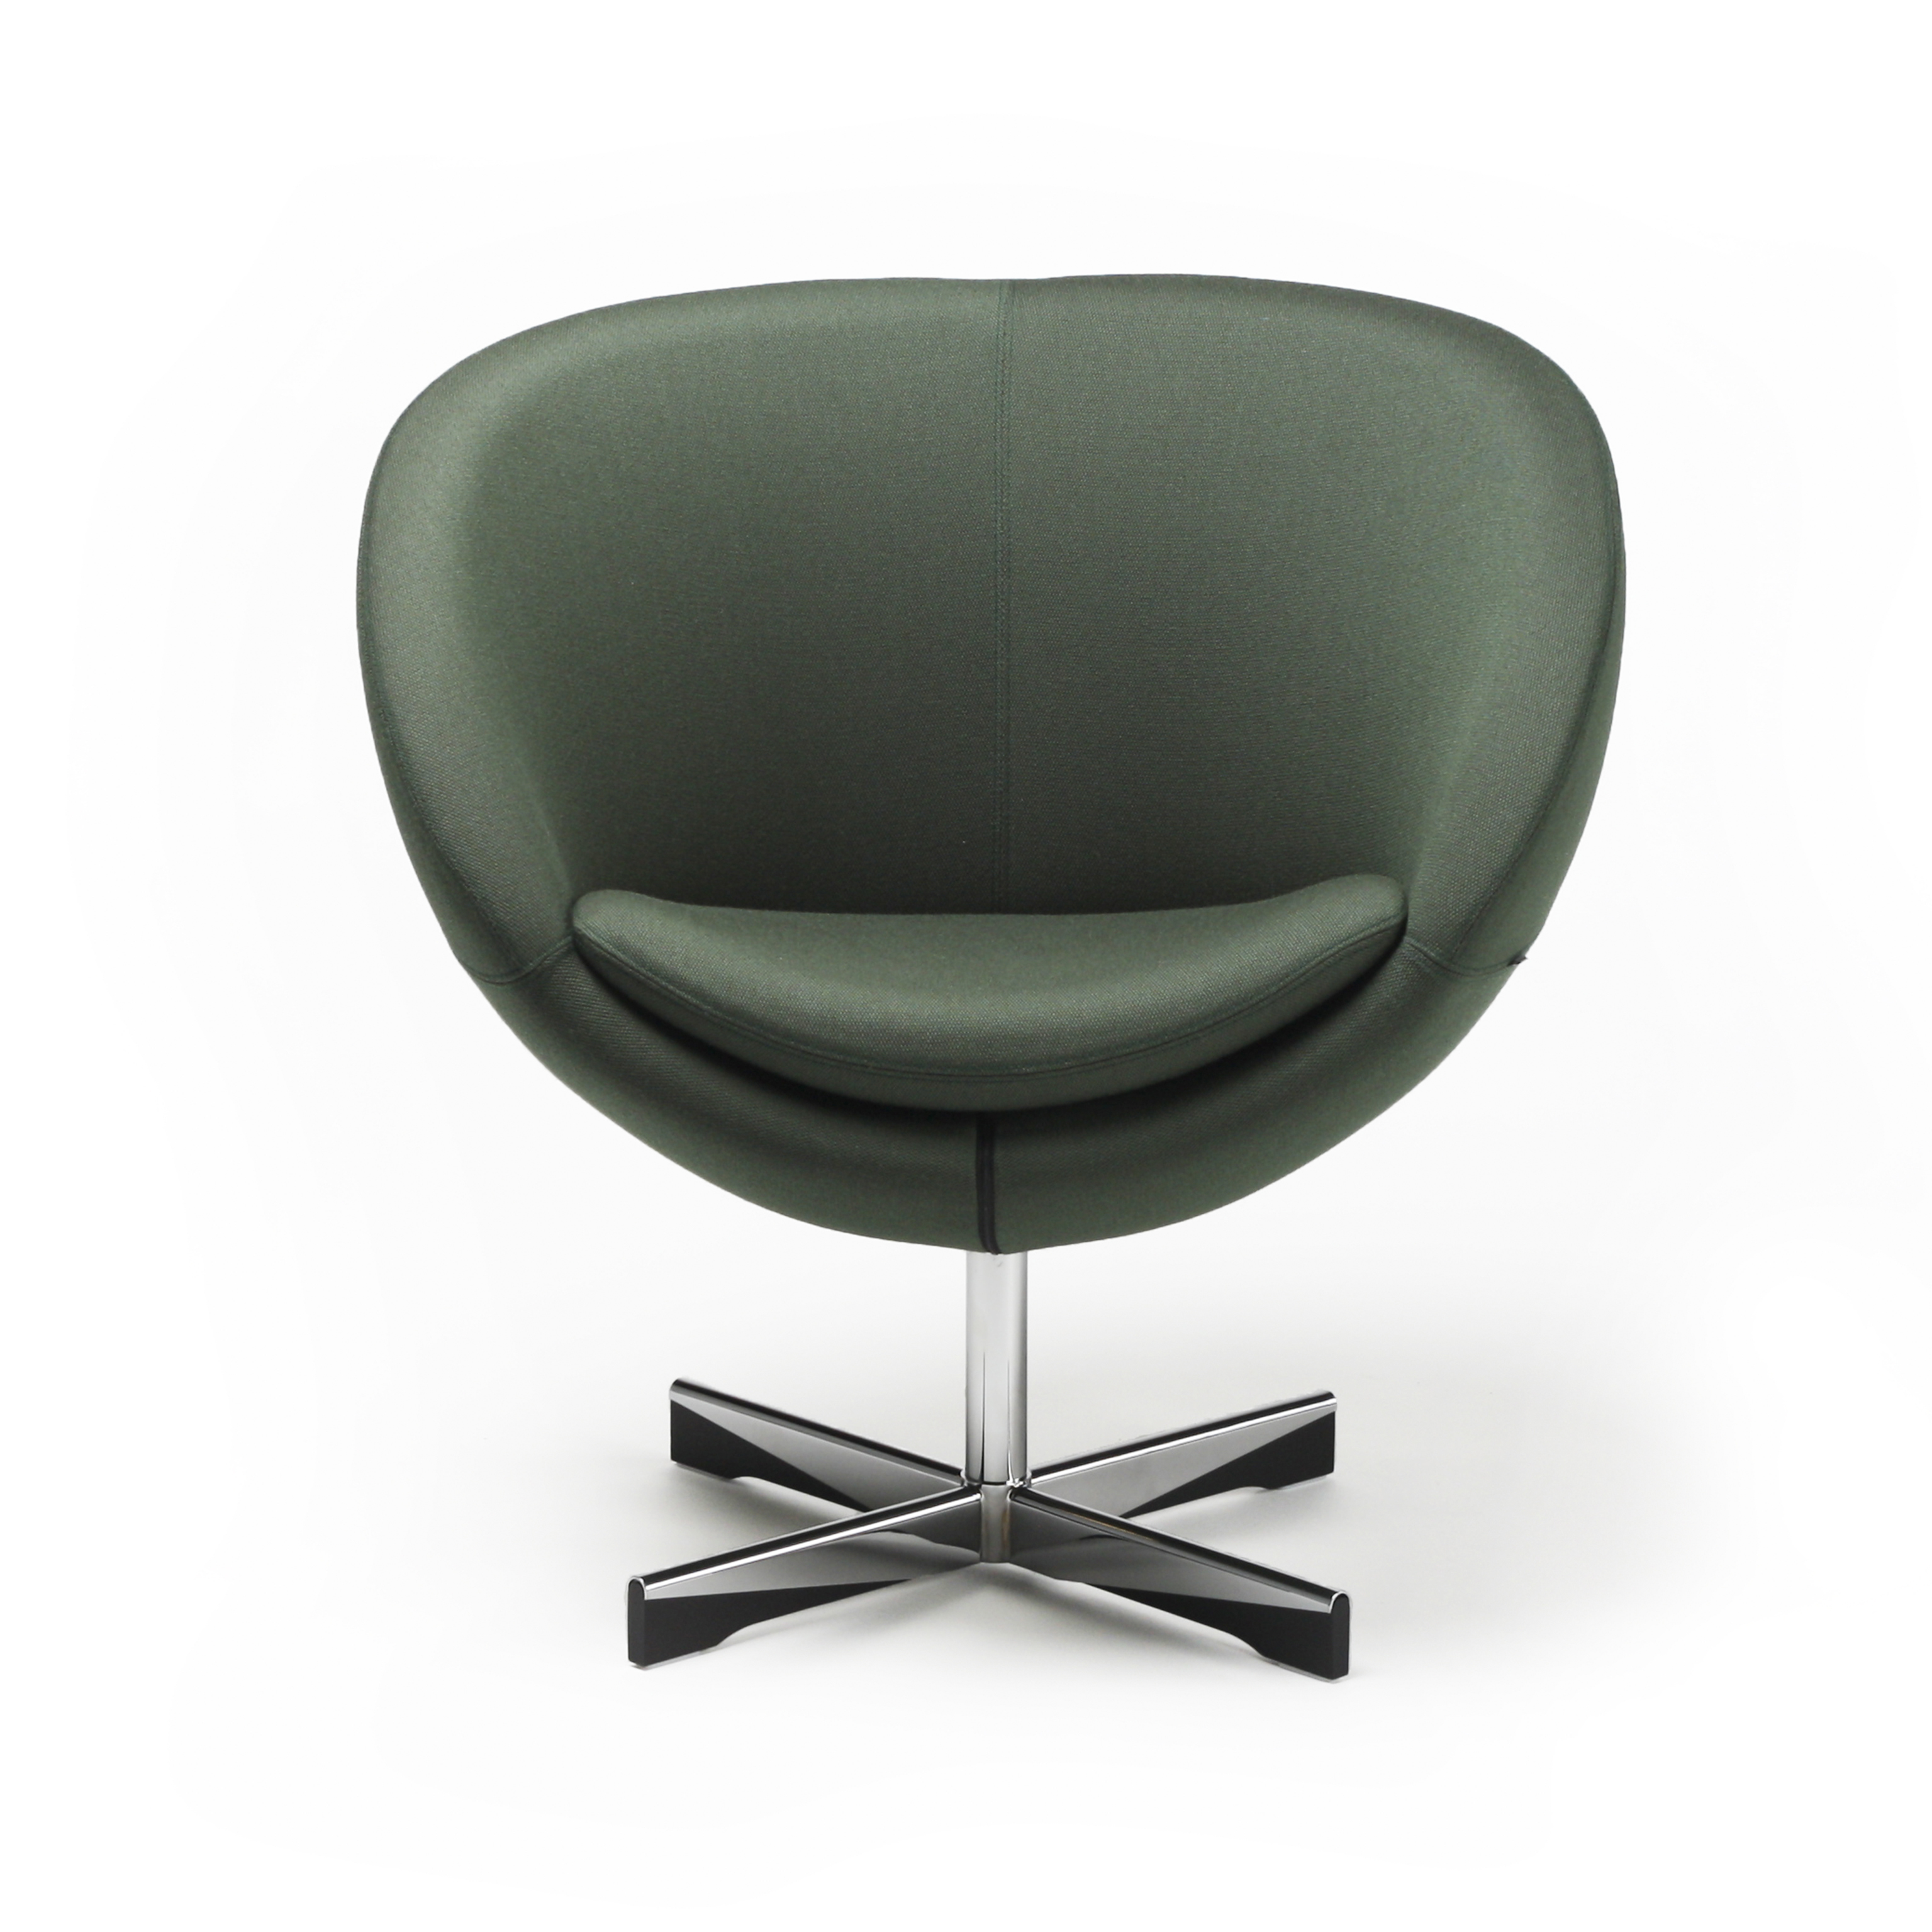 Planet stol i grønn tekstil fra Fora Form